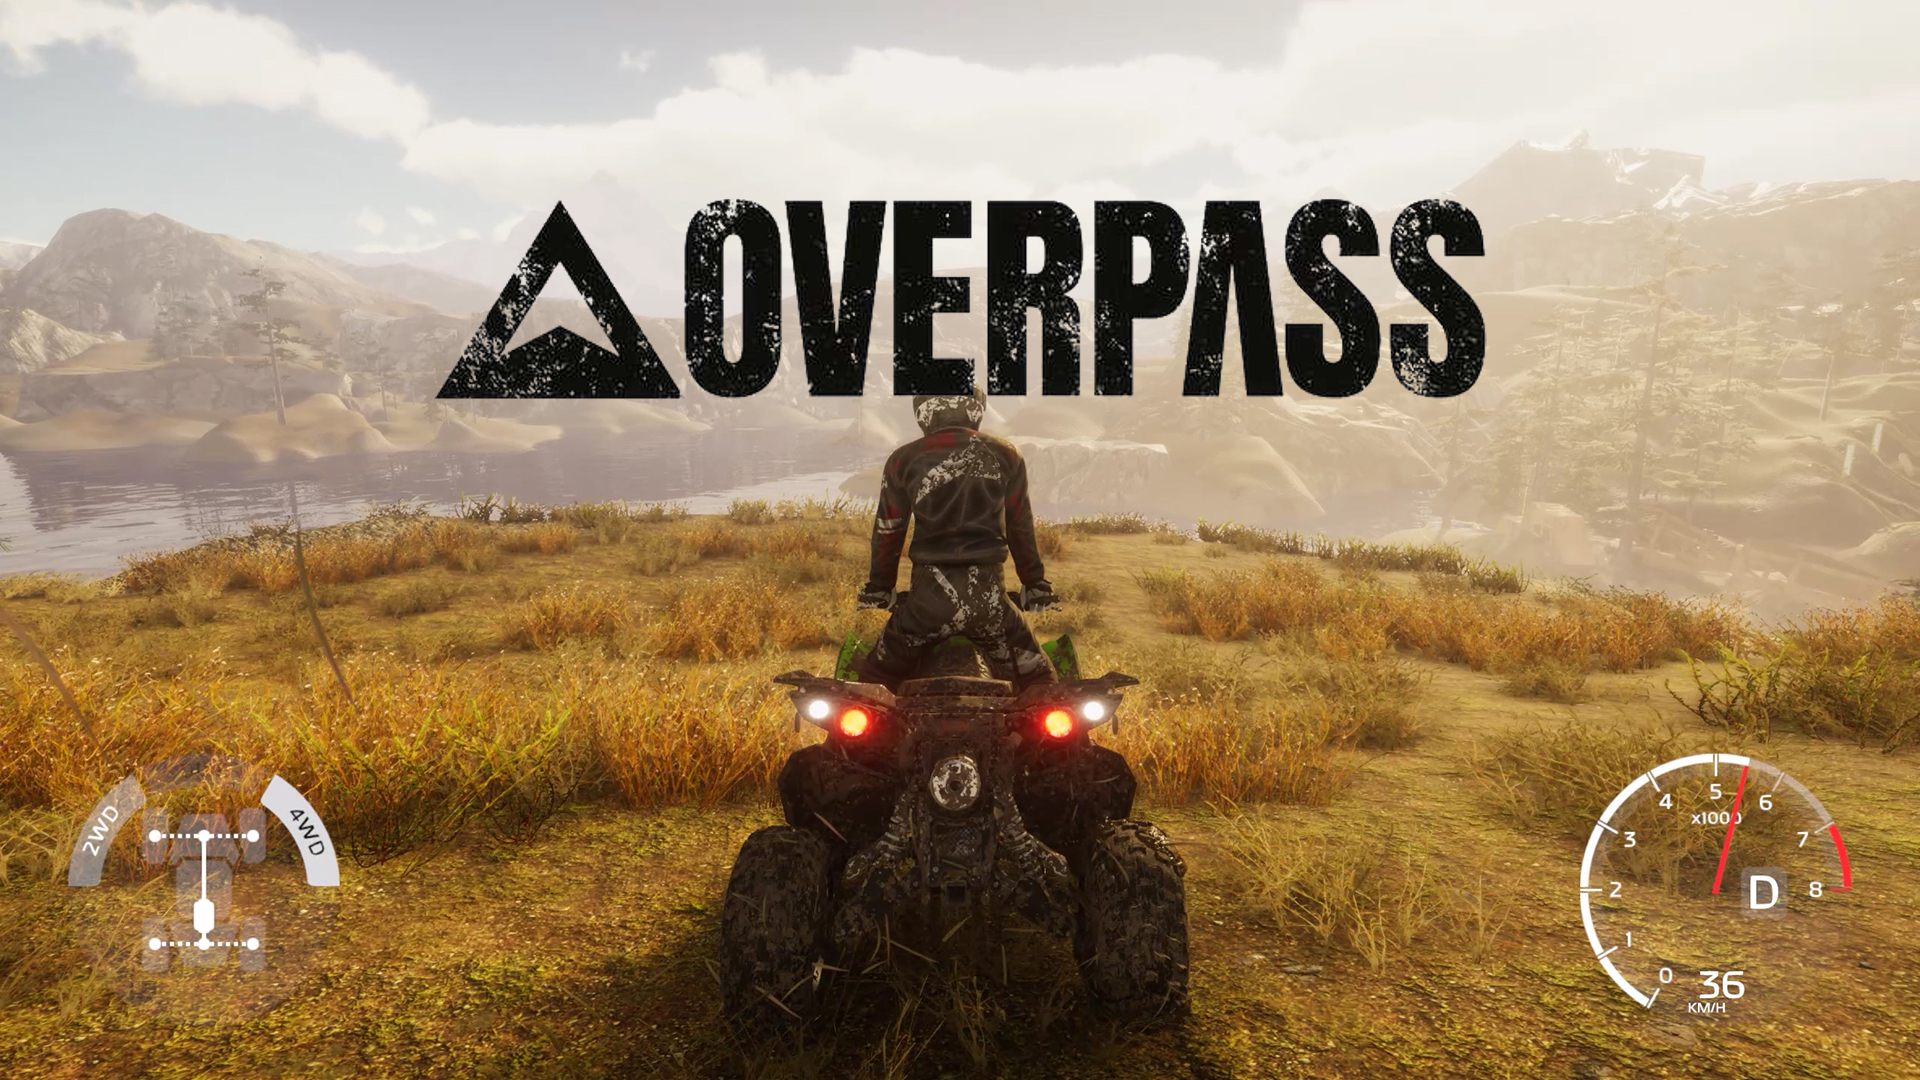 overpass game background wallpaper 71979